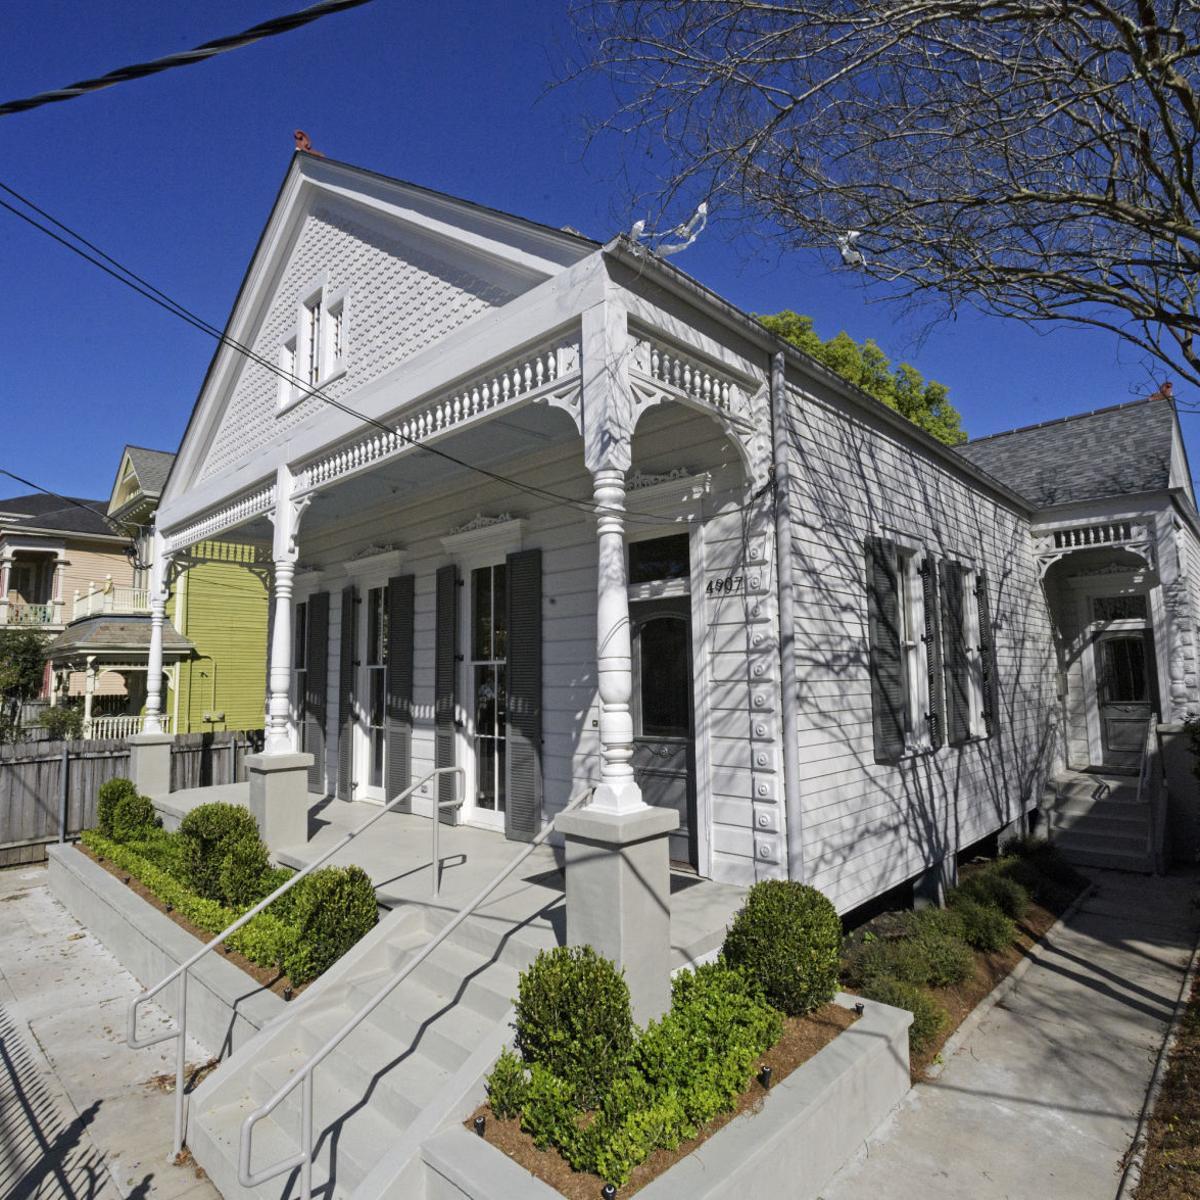 Once home to JFK killer Lee Harvey Oswald, Magazine Street